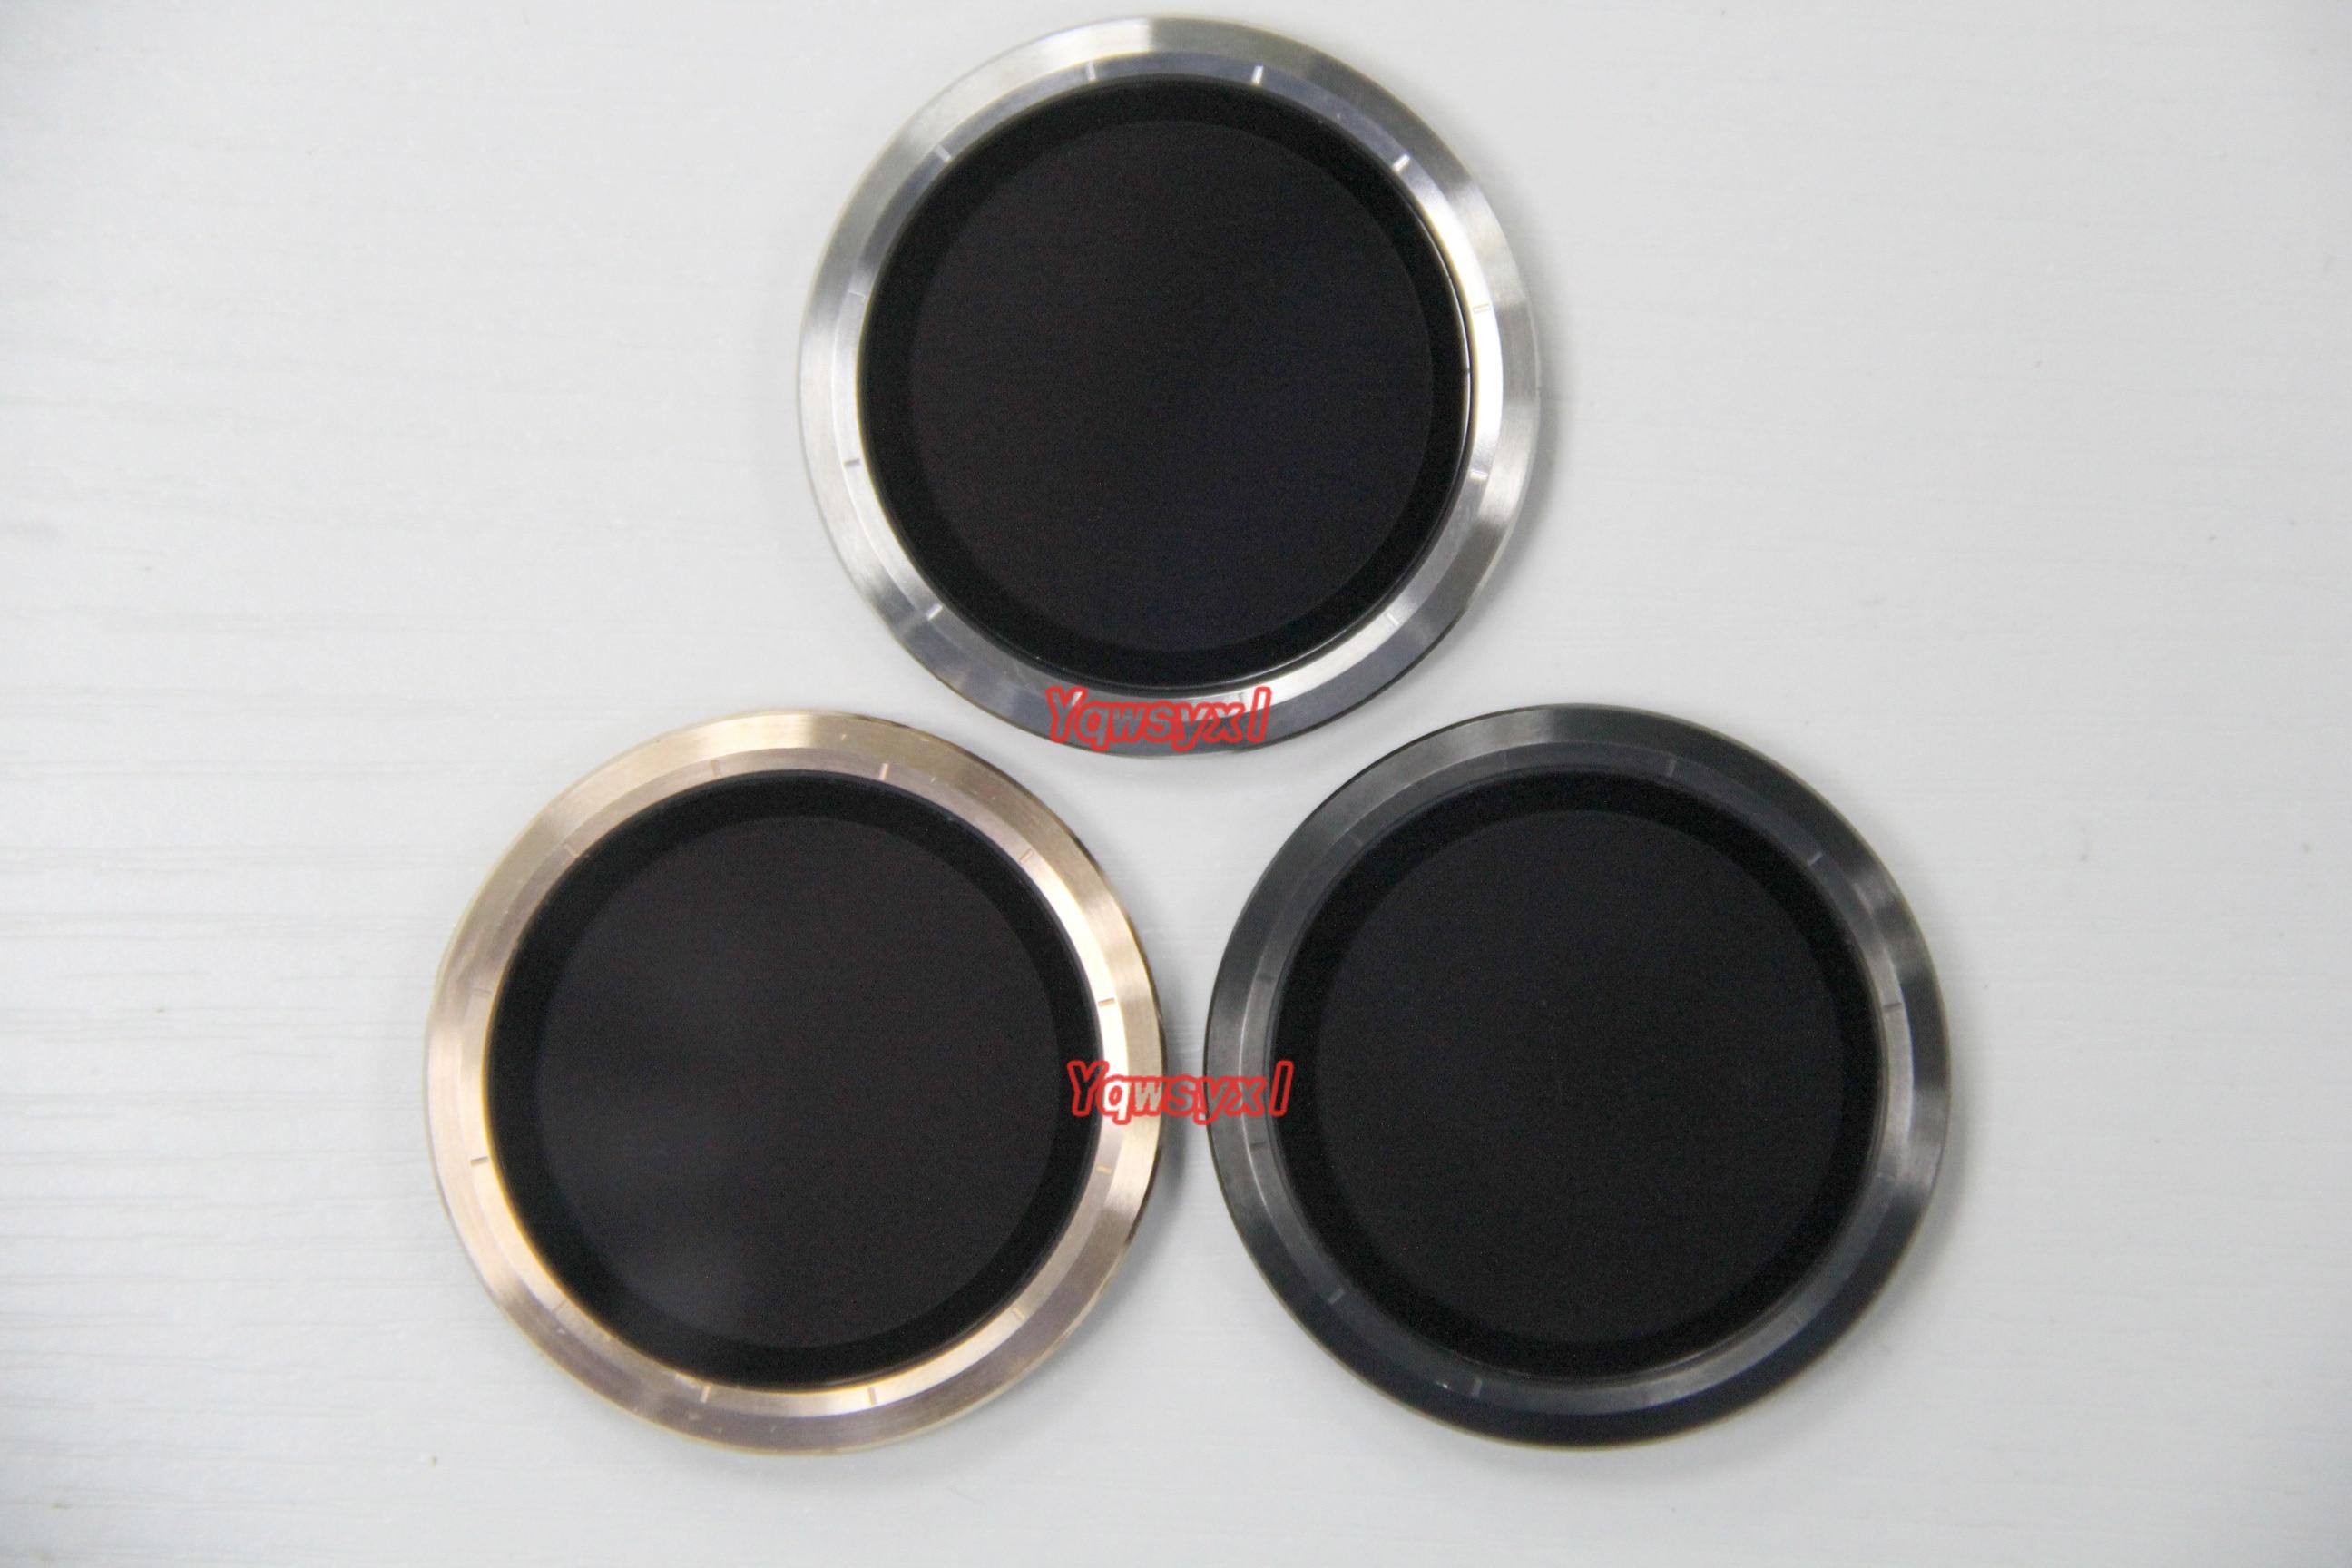 Yqwsyxl Original Slight Scratches LCD Screen Display For Garmin Vivoactive 3 Smart Watch Screen Golden/Black/silver Frame Cover